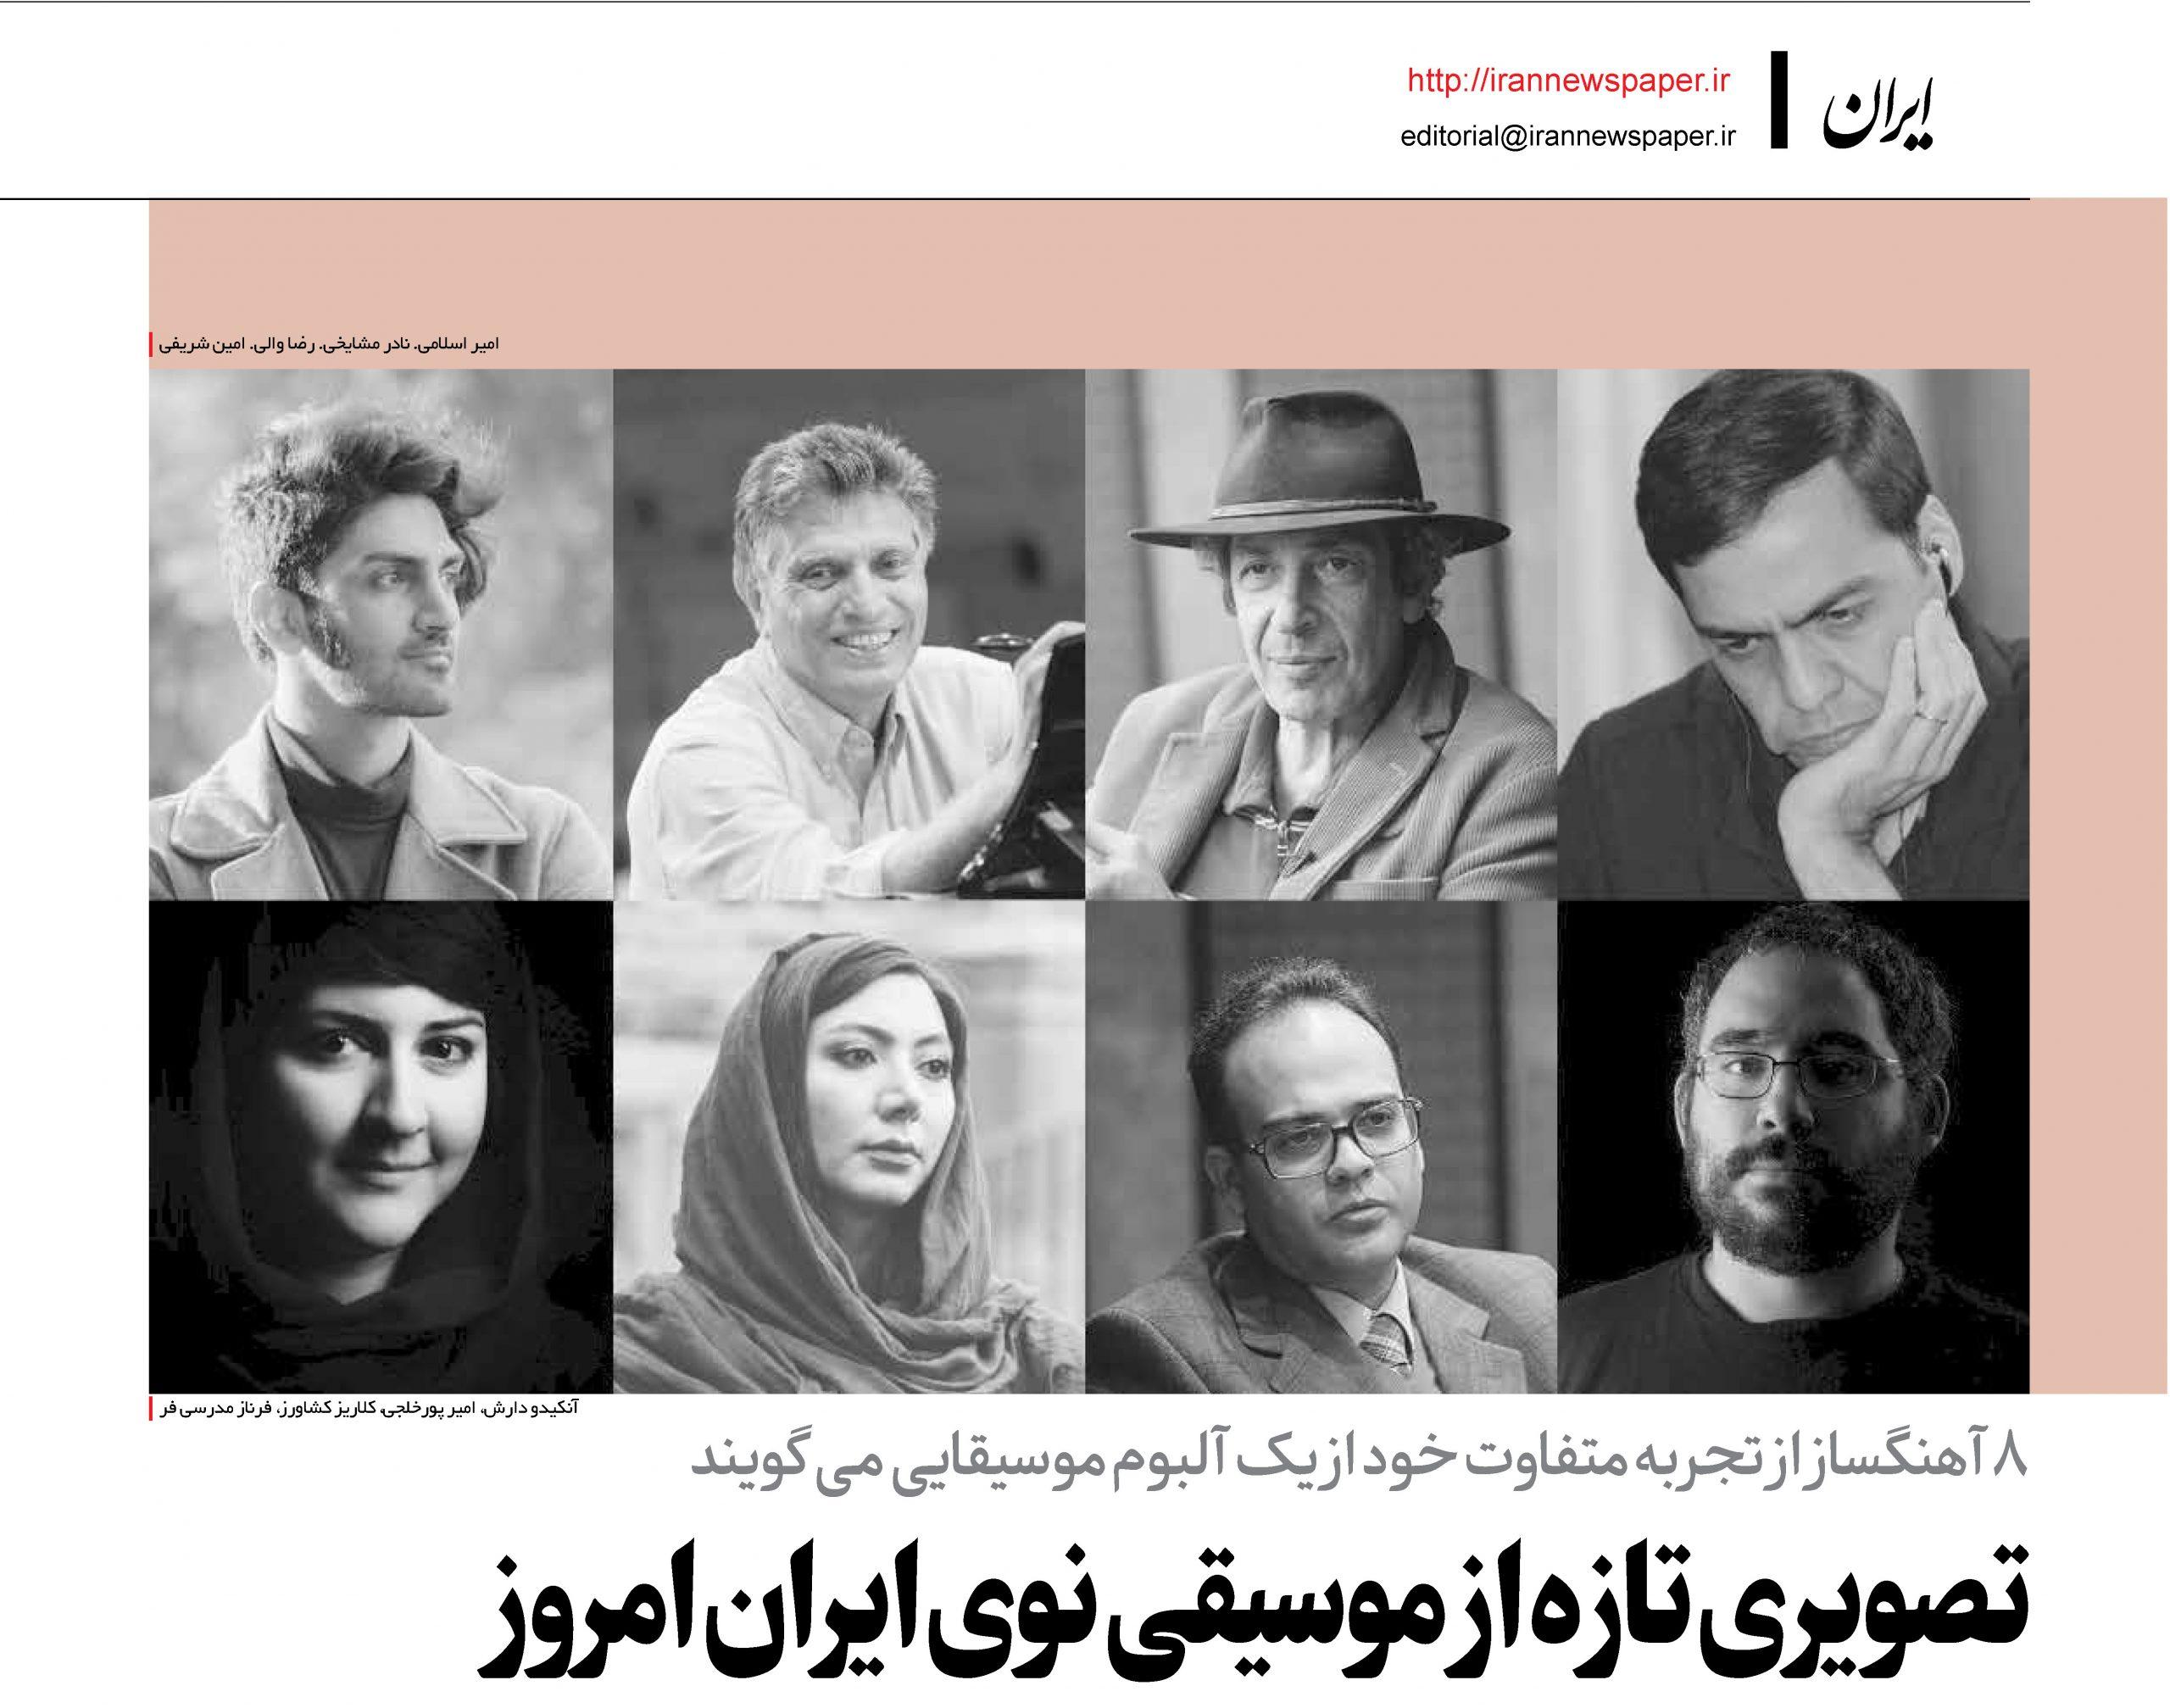 Amir Pourkhalaji Iran Newspaper امیر پورخلجی روزنامه ایران